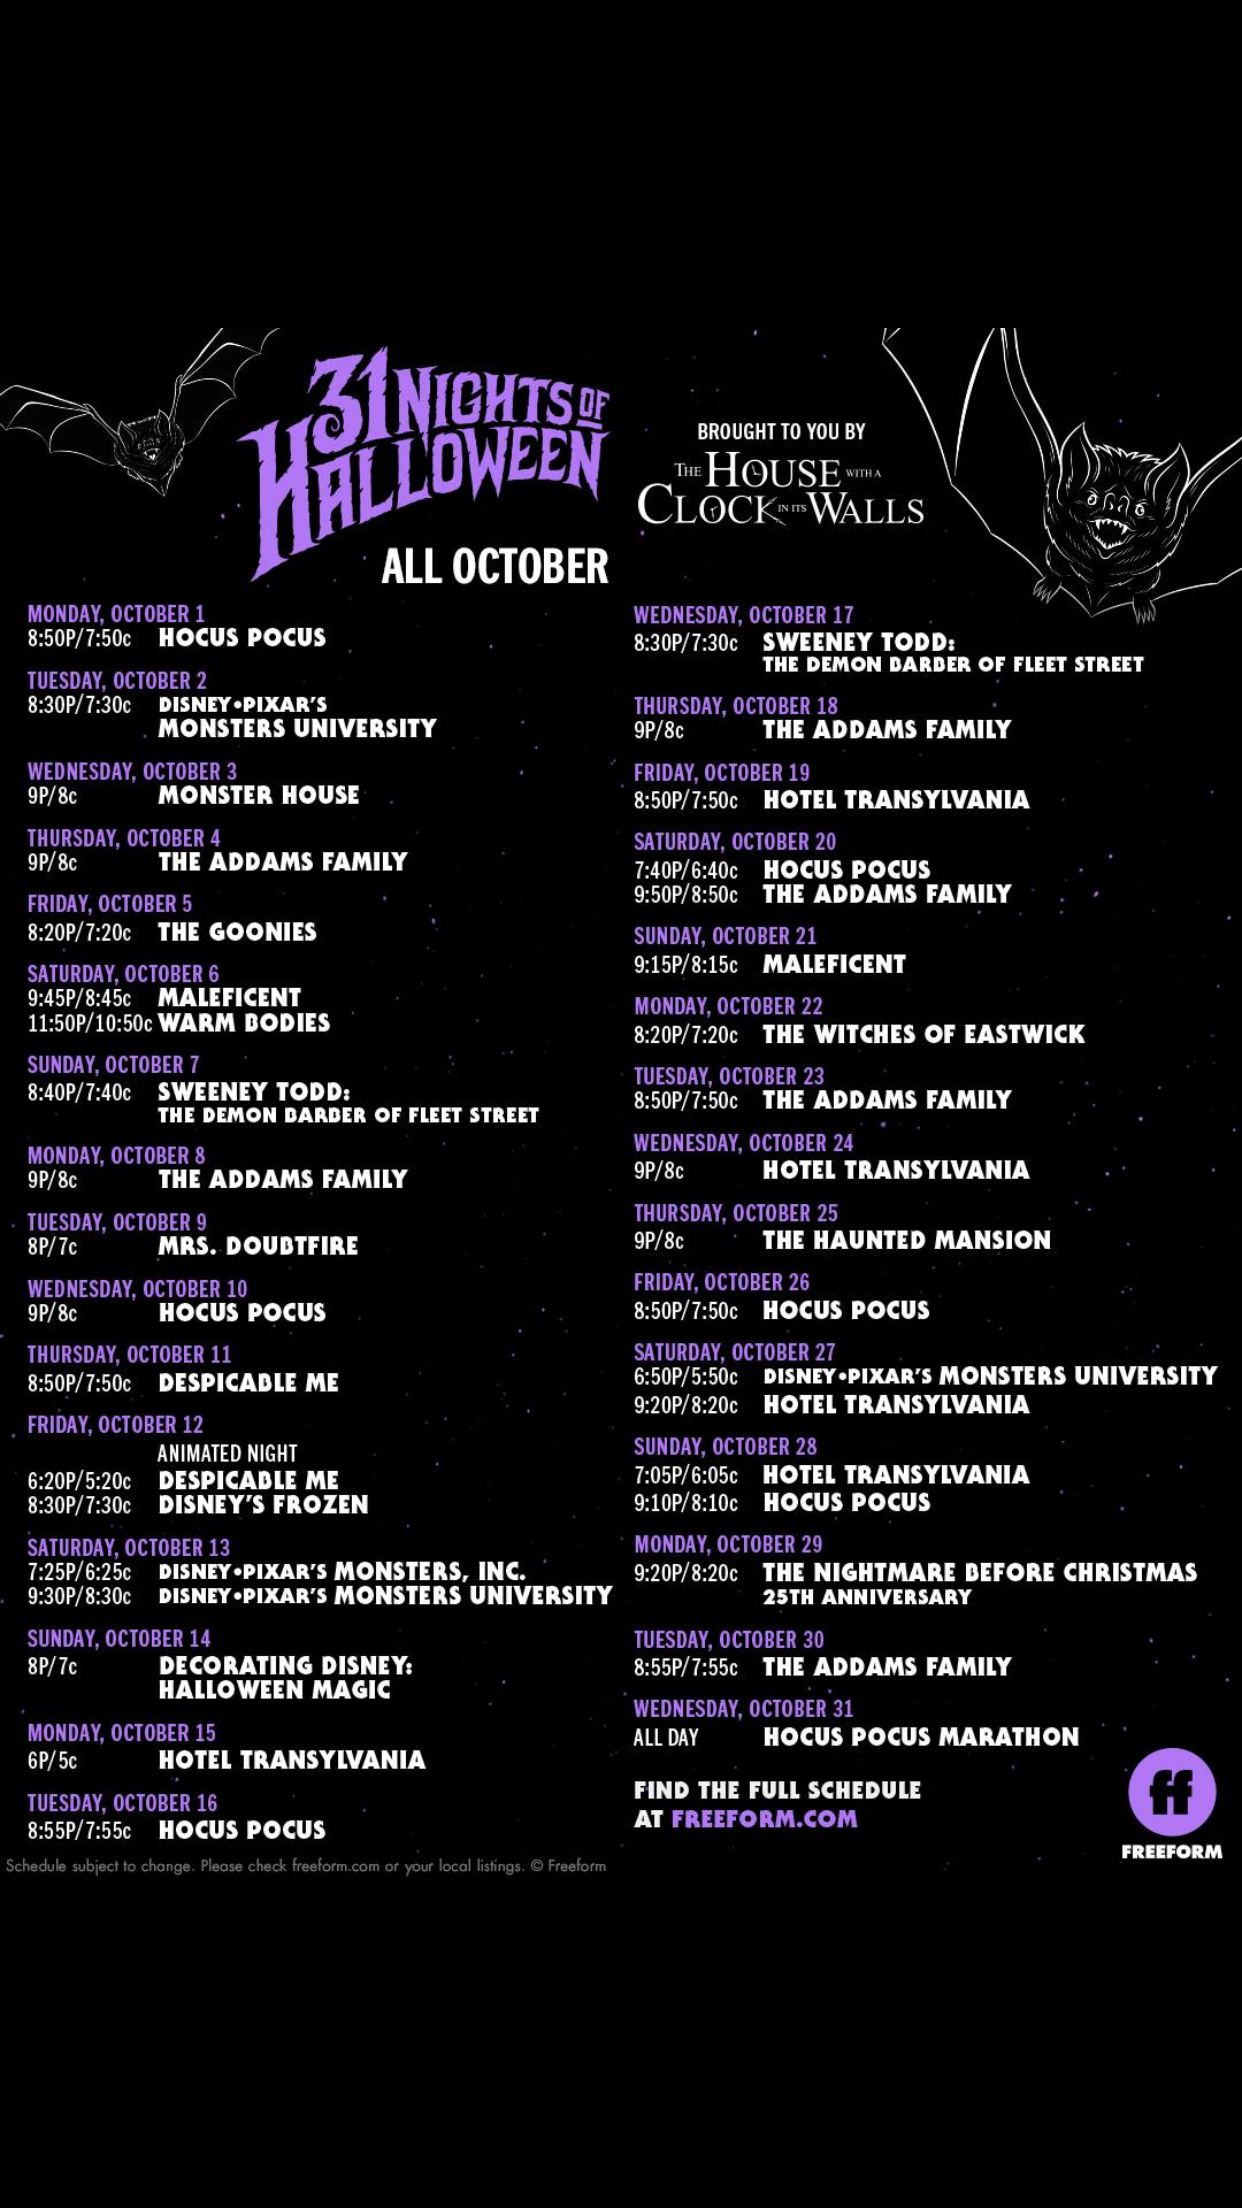 2018 Freeform 31 Days of Halloween programming Halloween